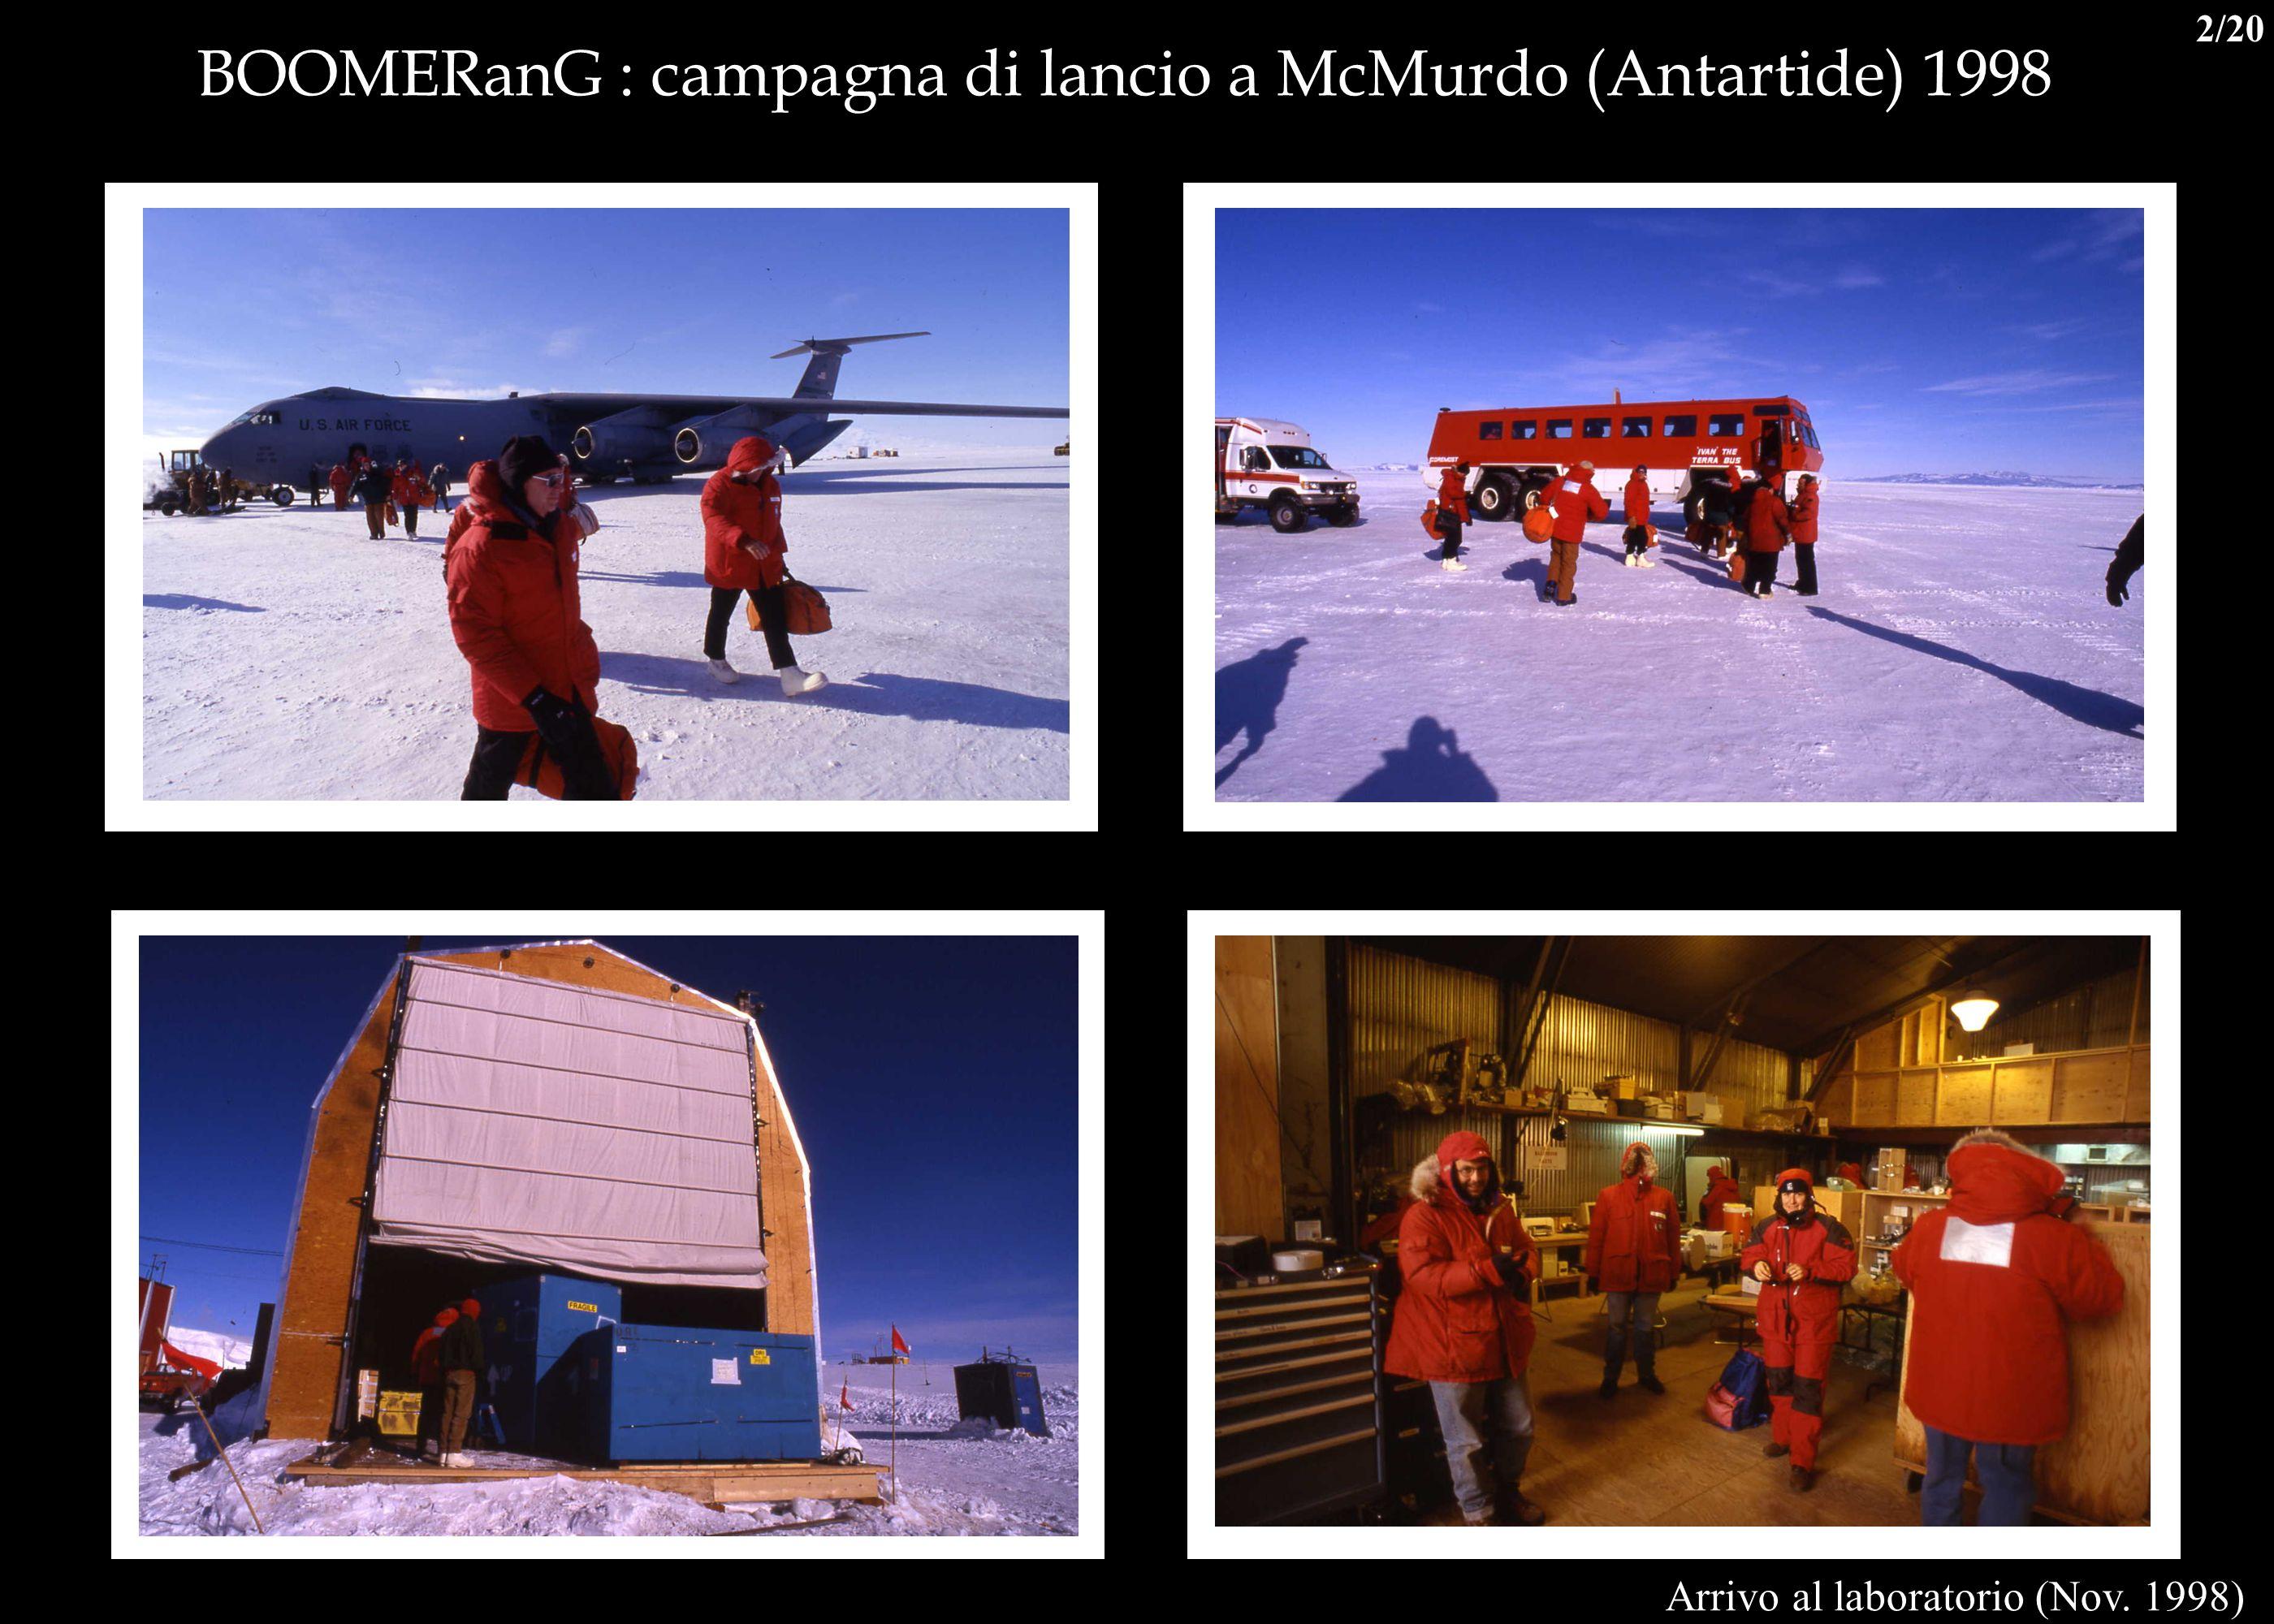 BOOMERanG : campagna di lancio a McMurdo (Antartide) 1998 Arrivo al laboratorio (Nov. 1998) 2/20